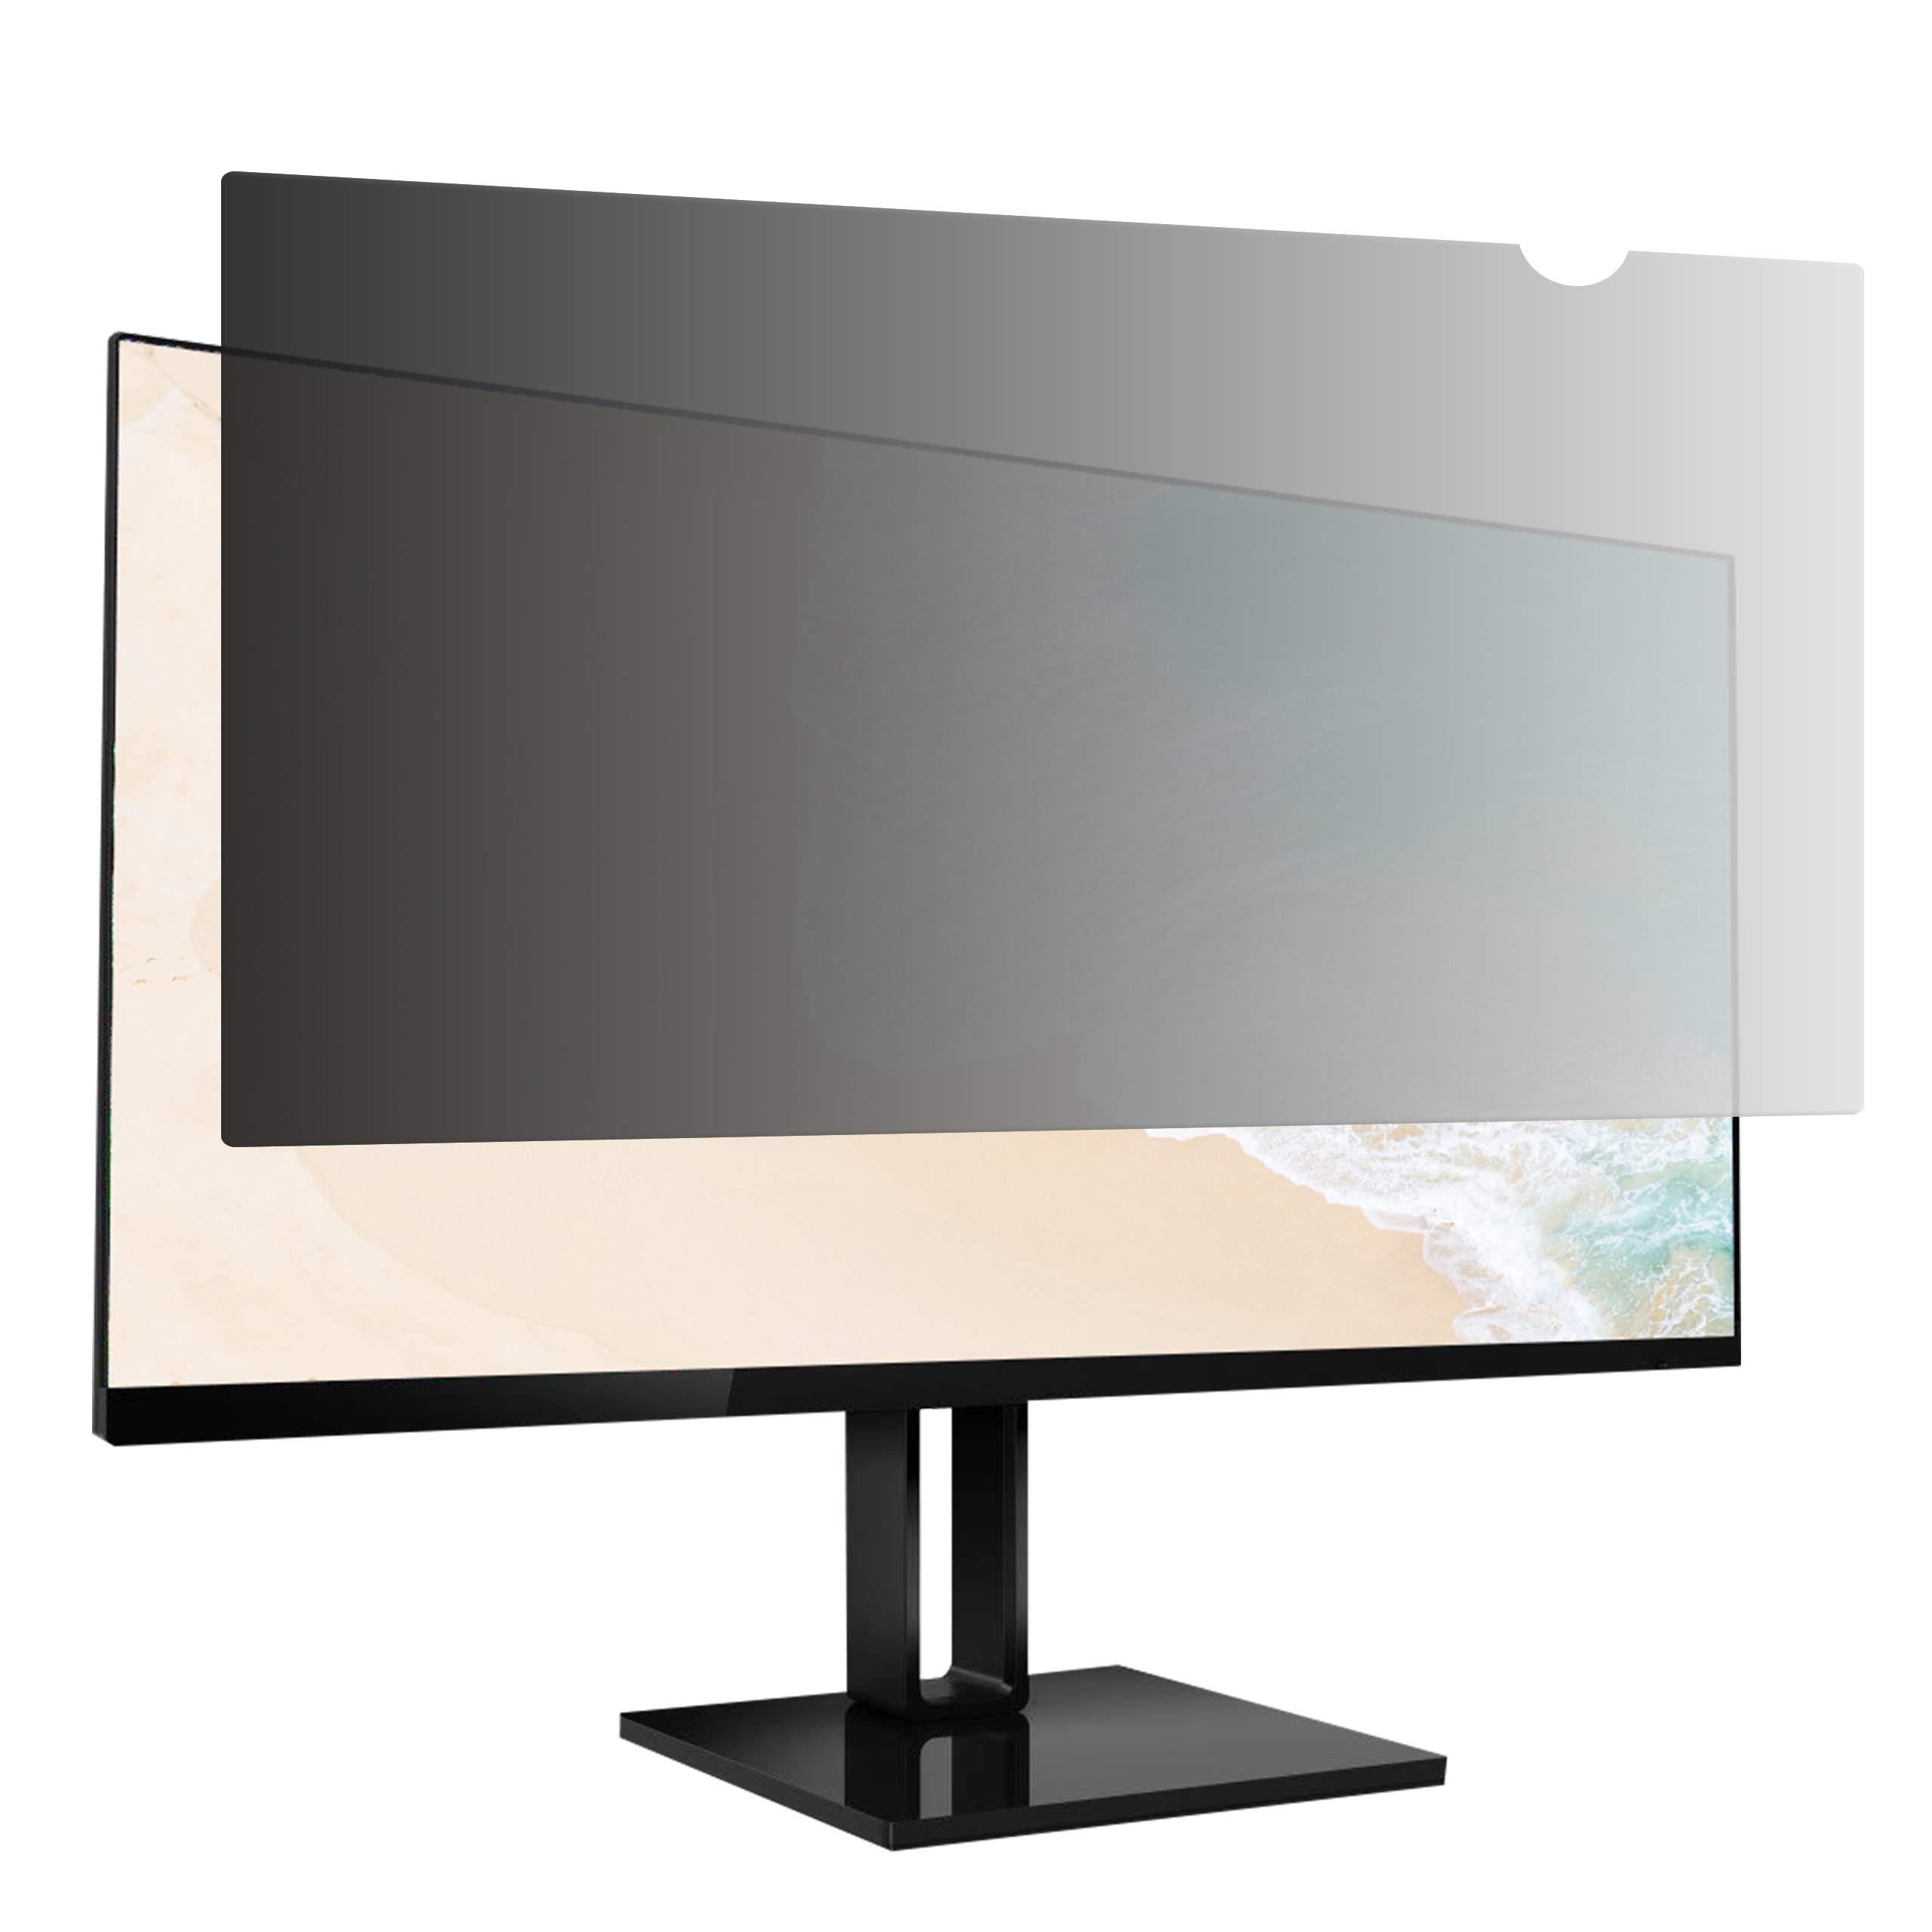 AmazonBasics Privacy Screen for 22'' Widescreen Monitor (16:9)